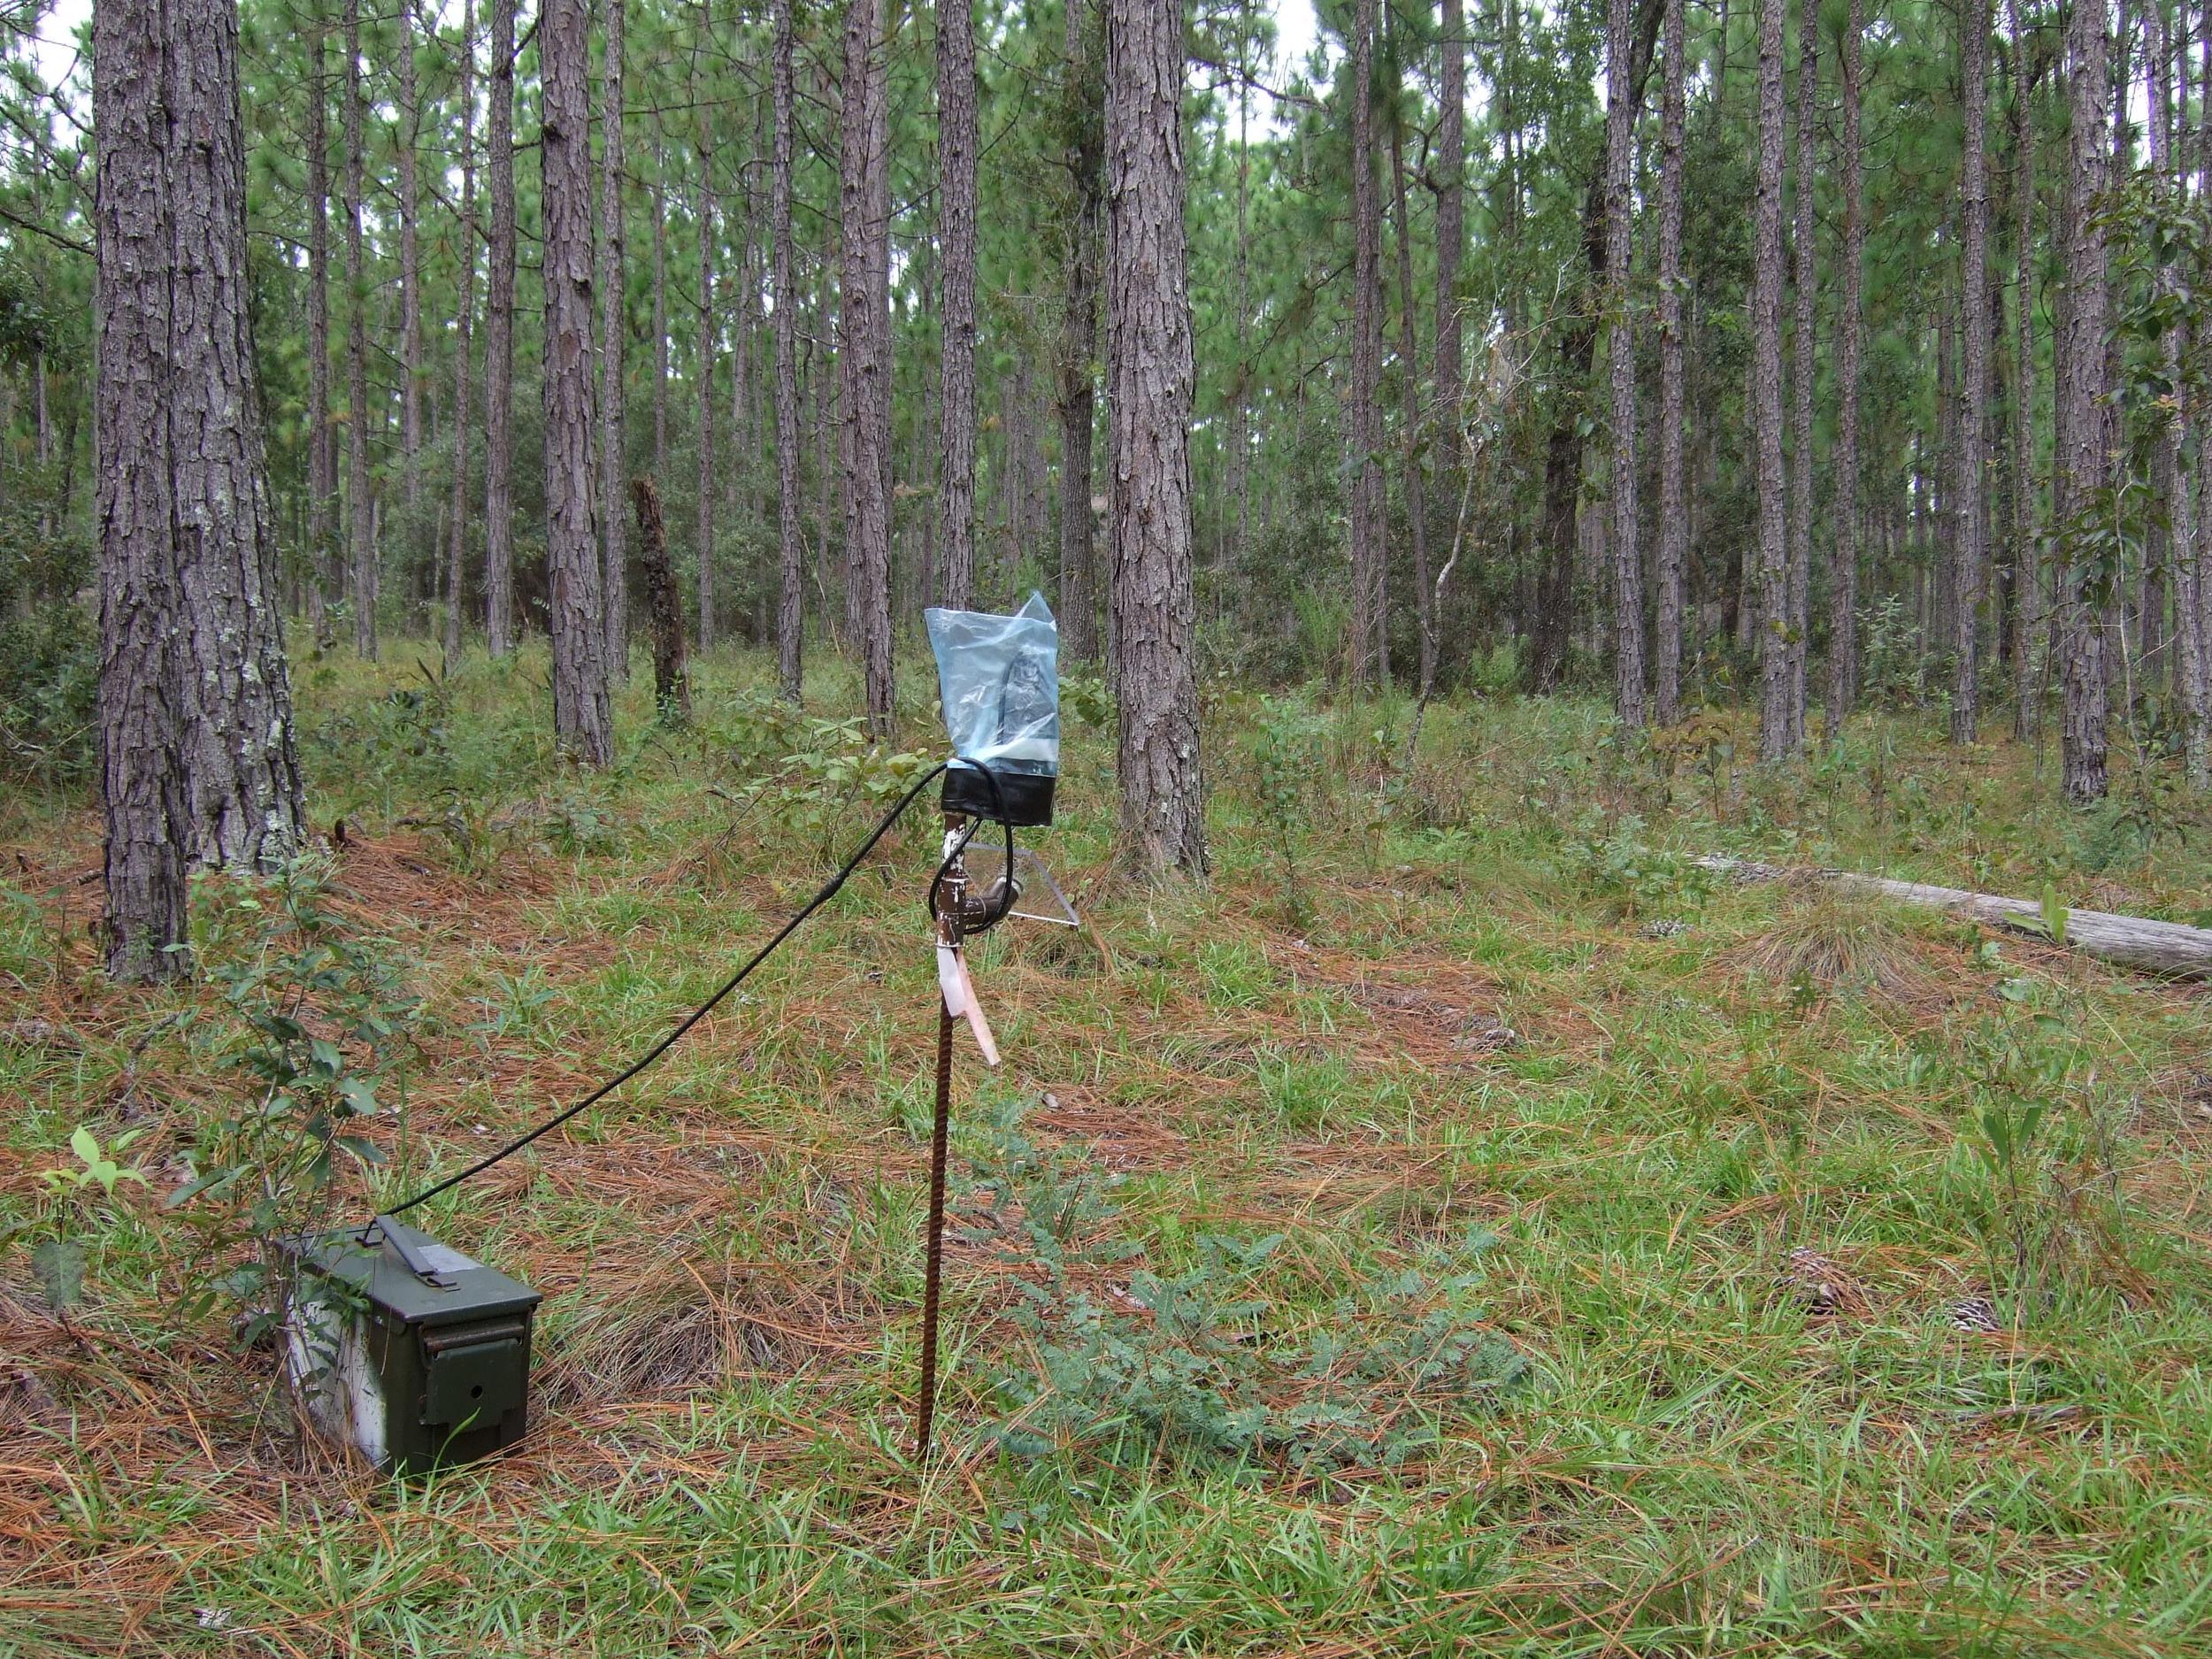 Field work Ordway 051.jpg